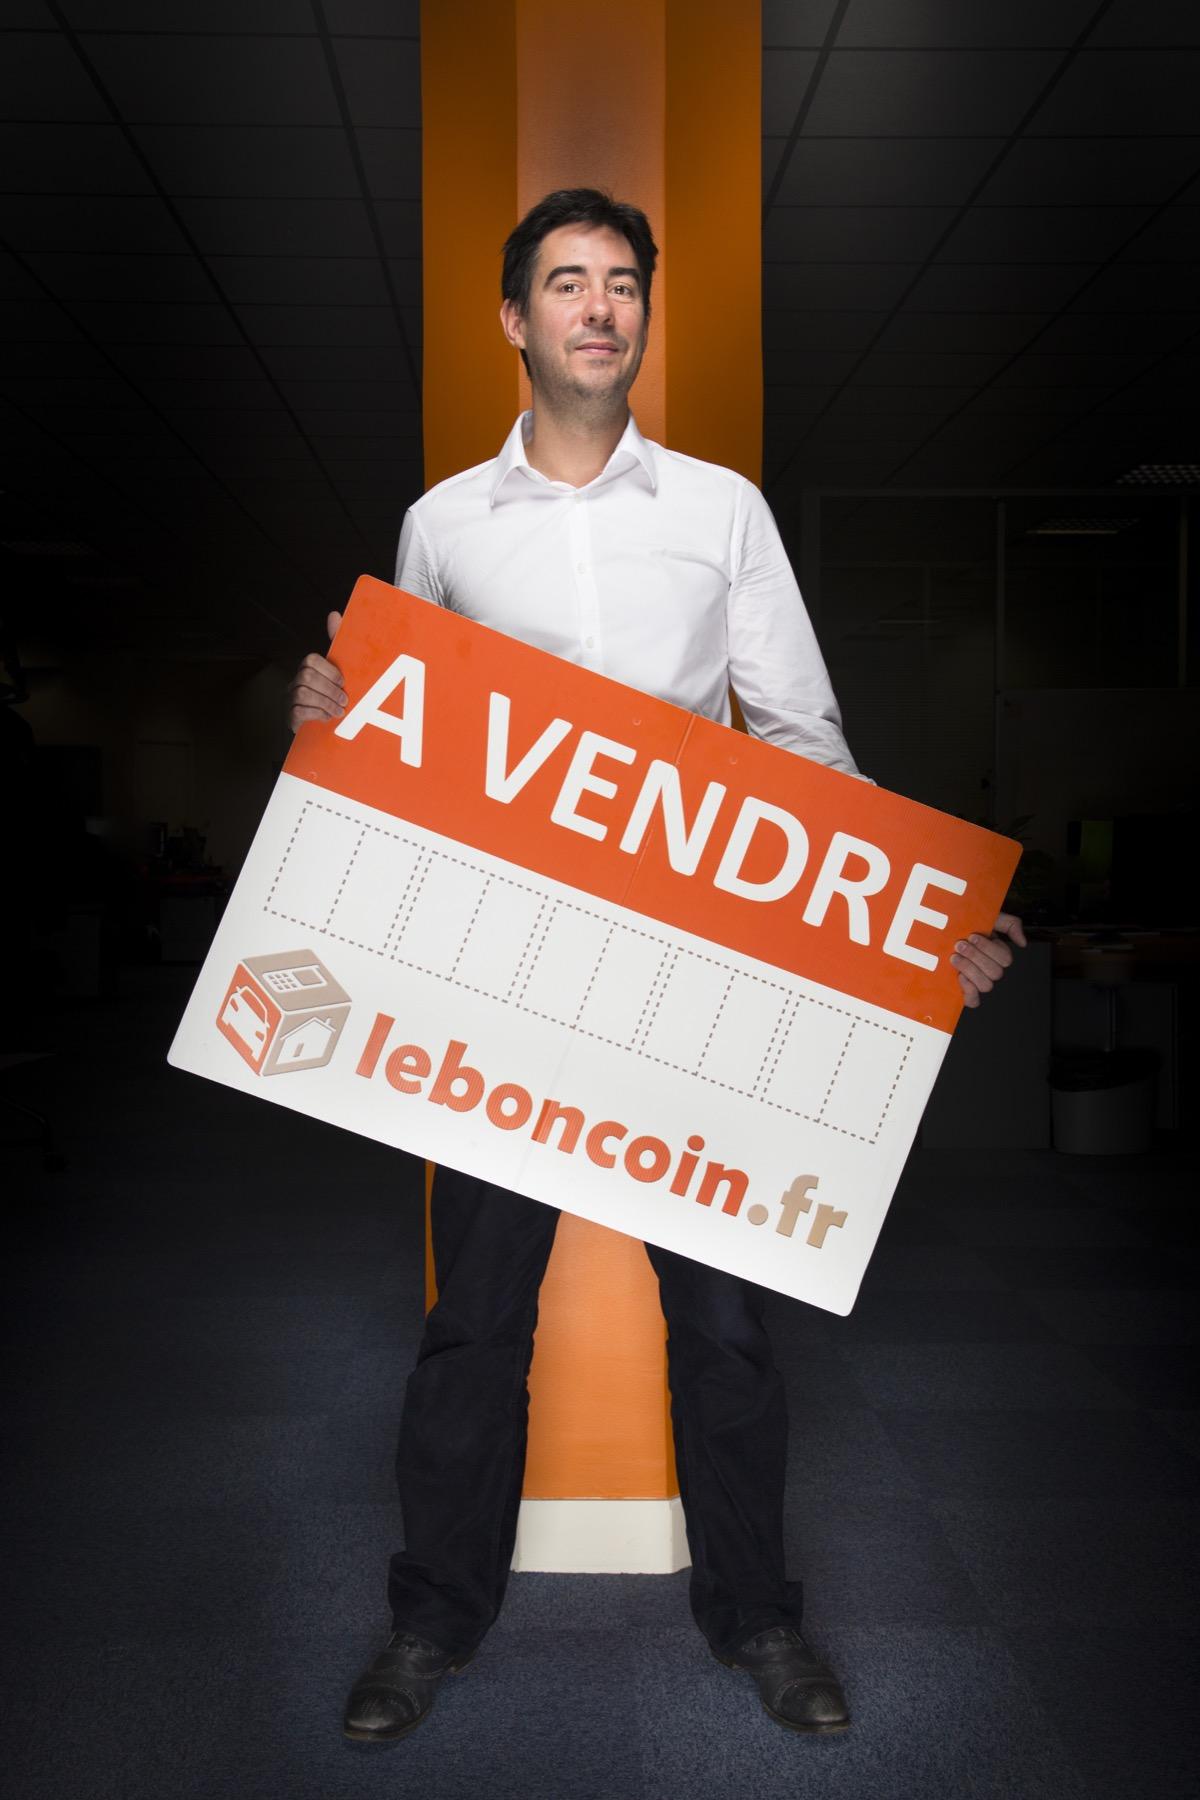 Olivier Aizac